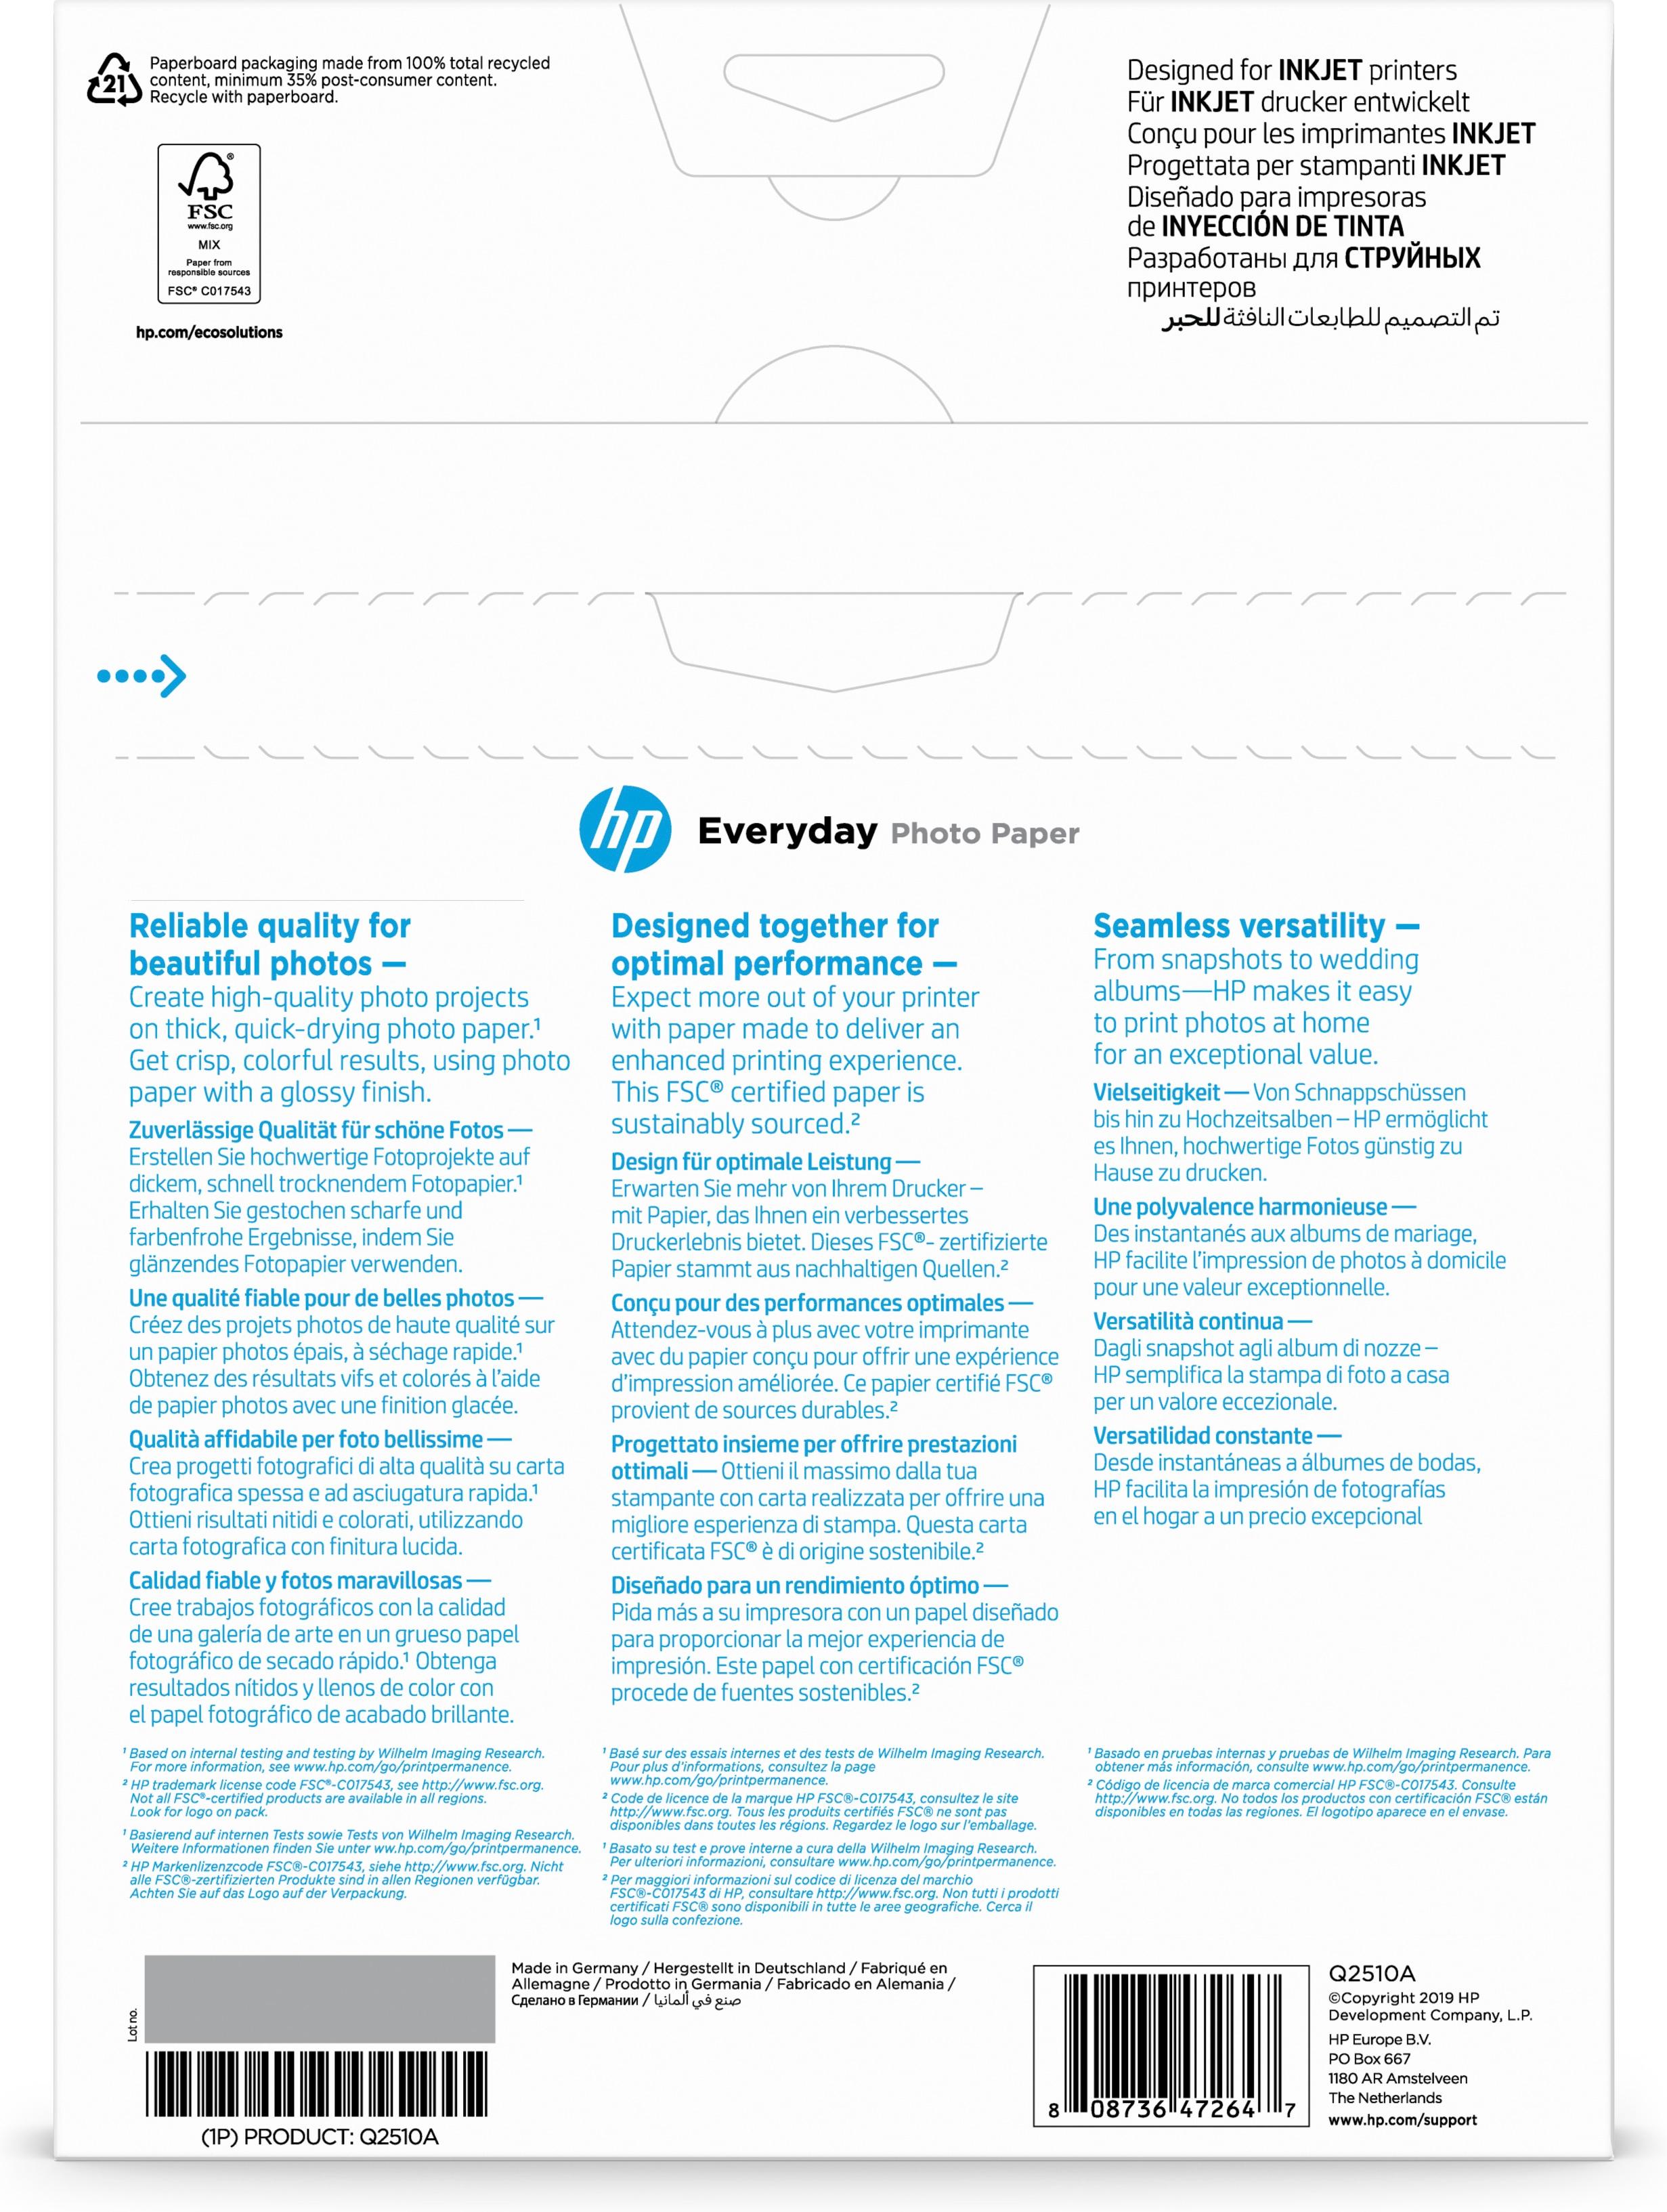 Q2510a Everyday Photo Paper (semi-glossy, 170 g/m², 100 vellen A4)